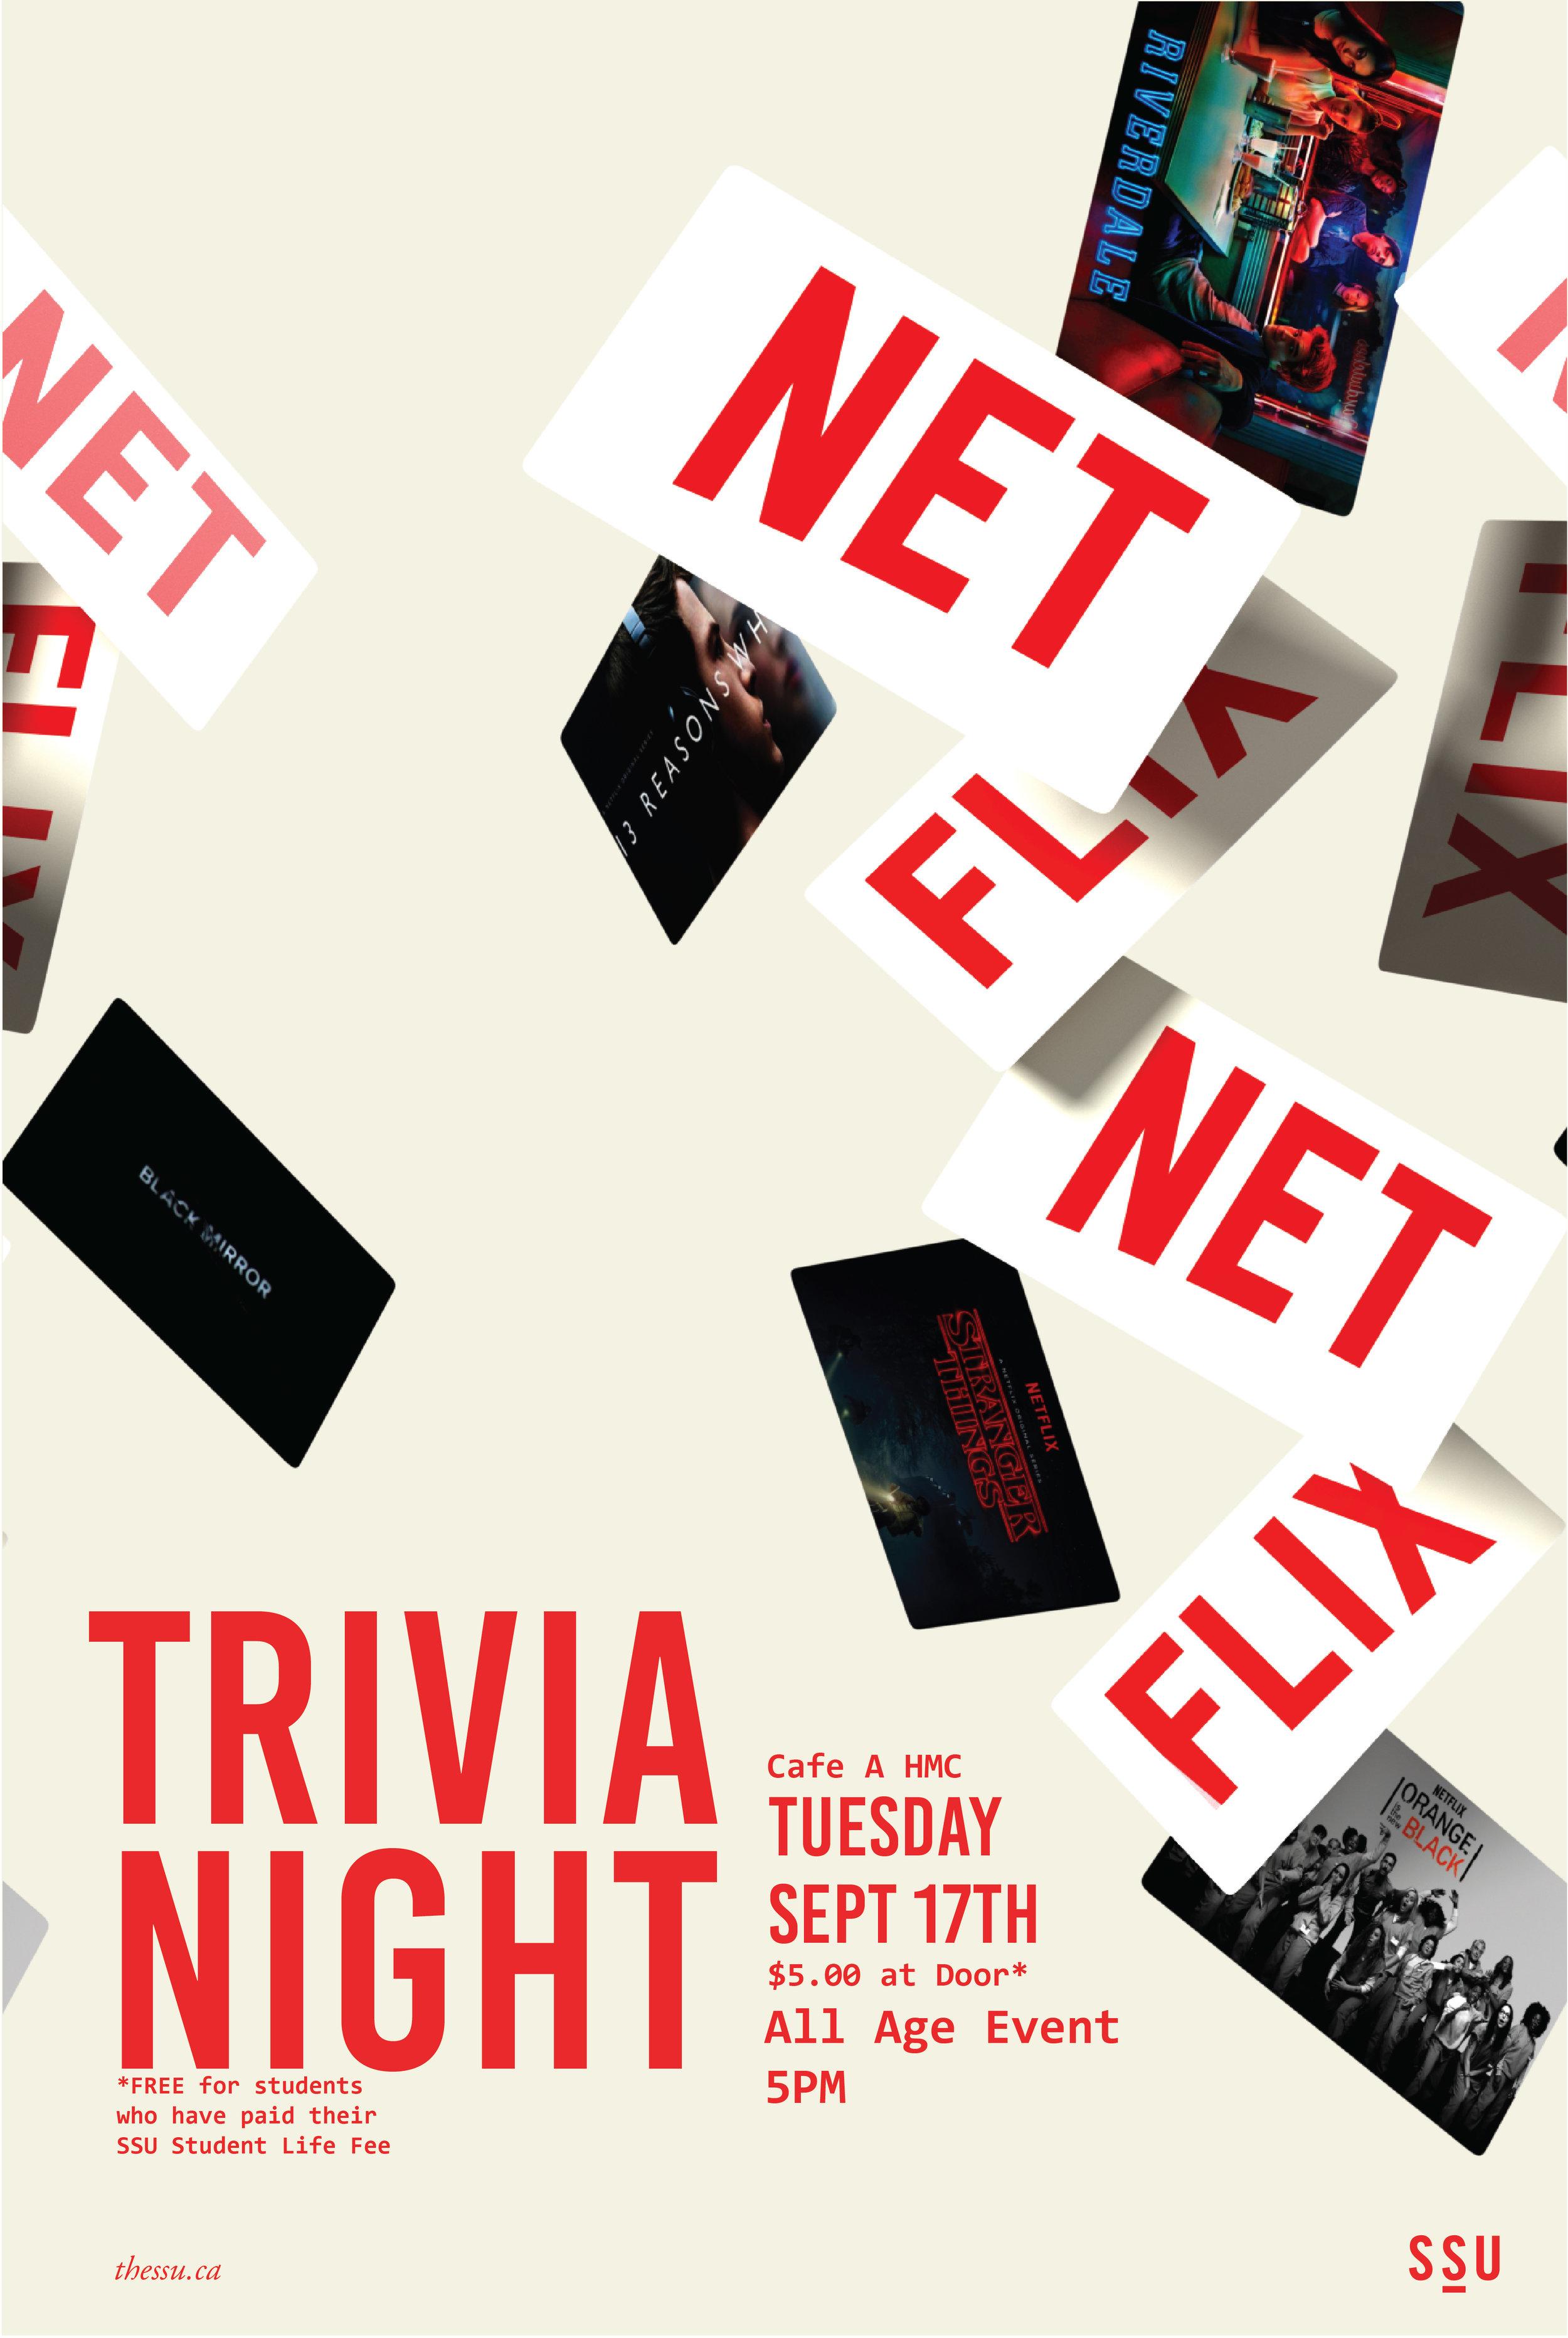 Netflix_Trivia_Poster_HMC-03_WEB.jpg